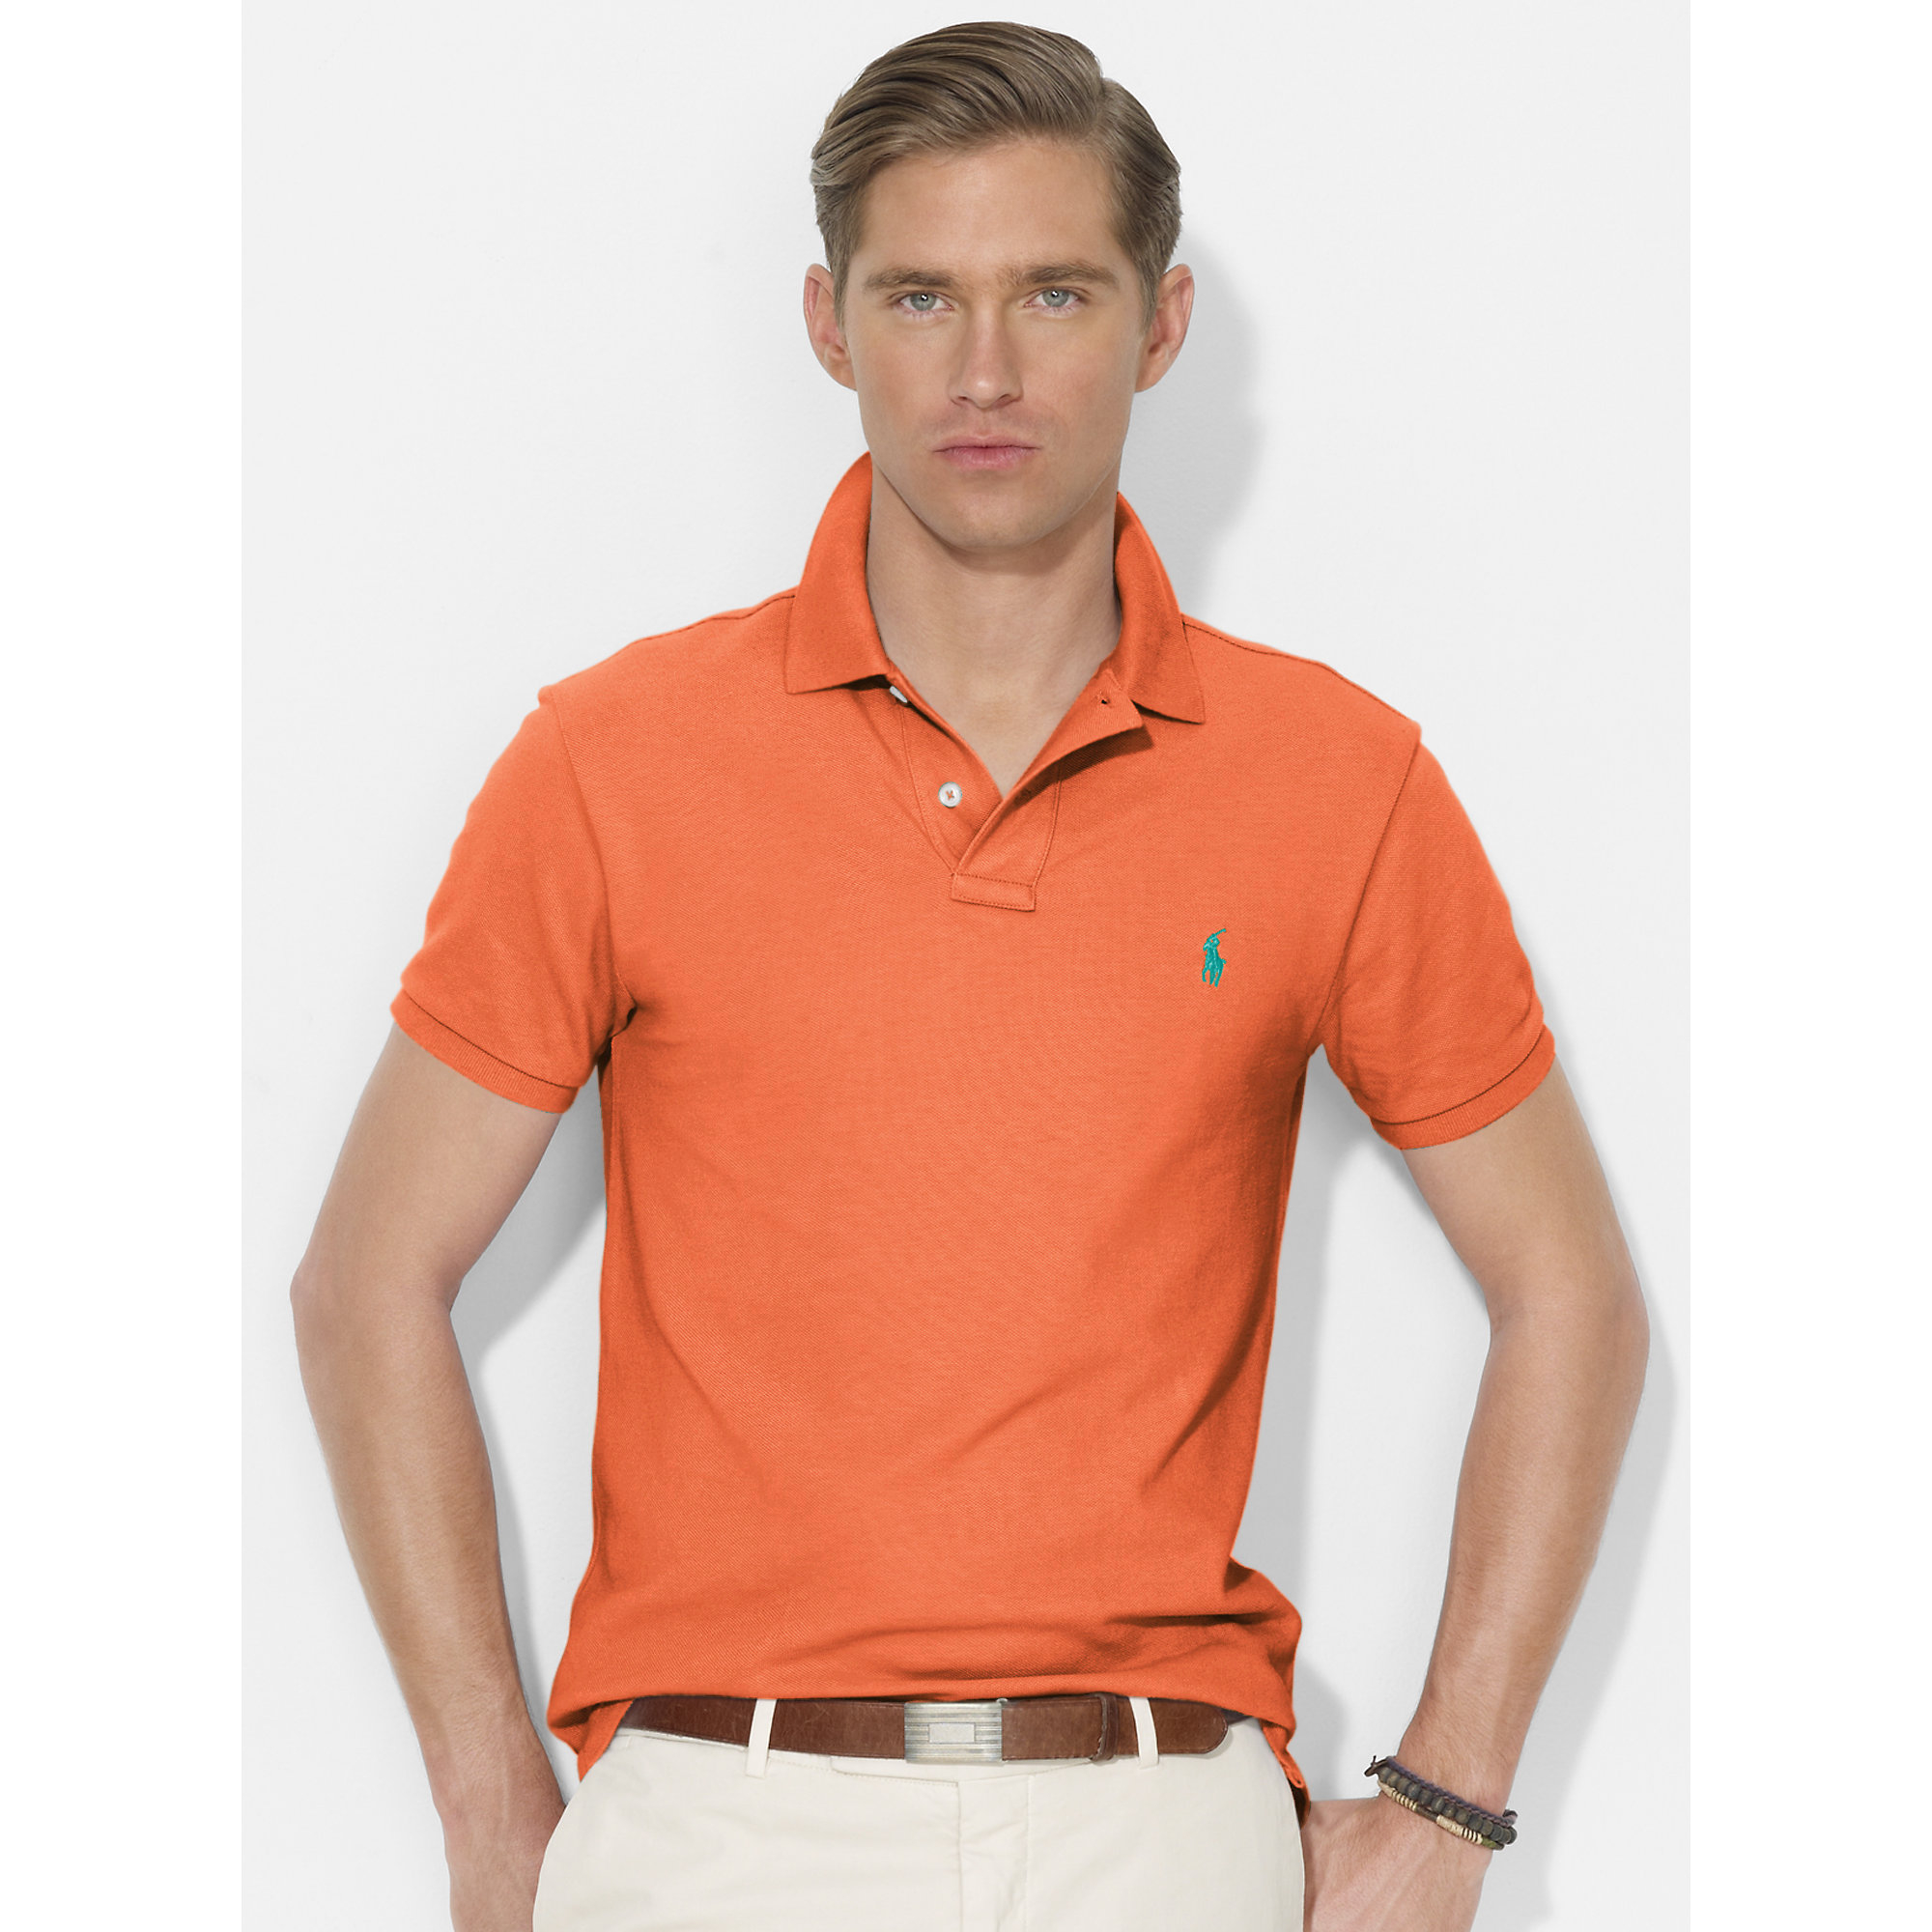 bfa792636 ... authentic lyst polo ralph lauren slim fit mesh polo in orange for men  692d1 73952